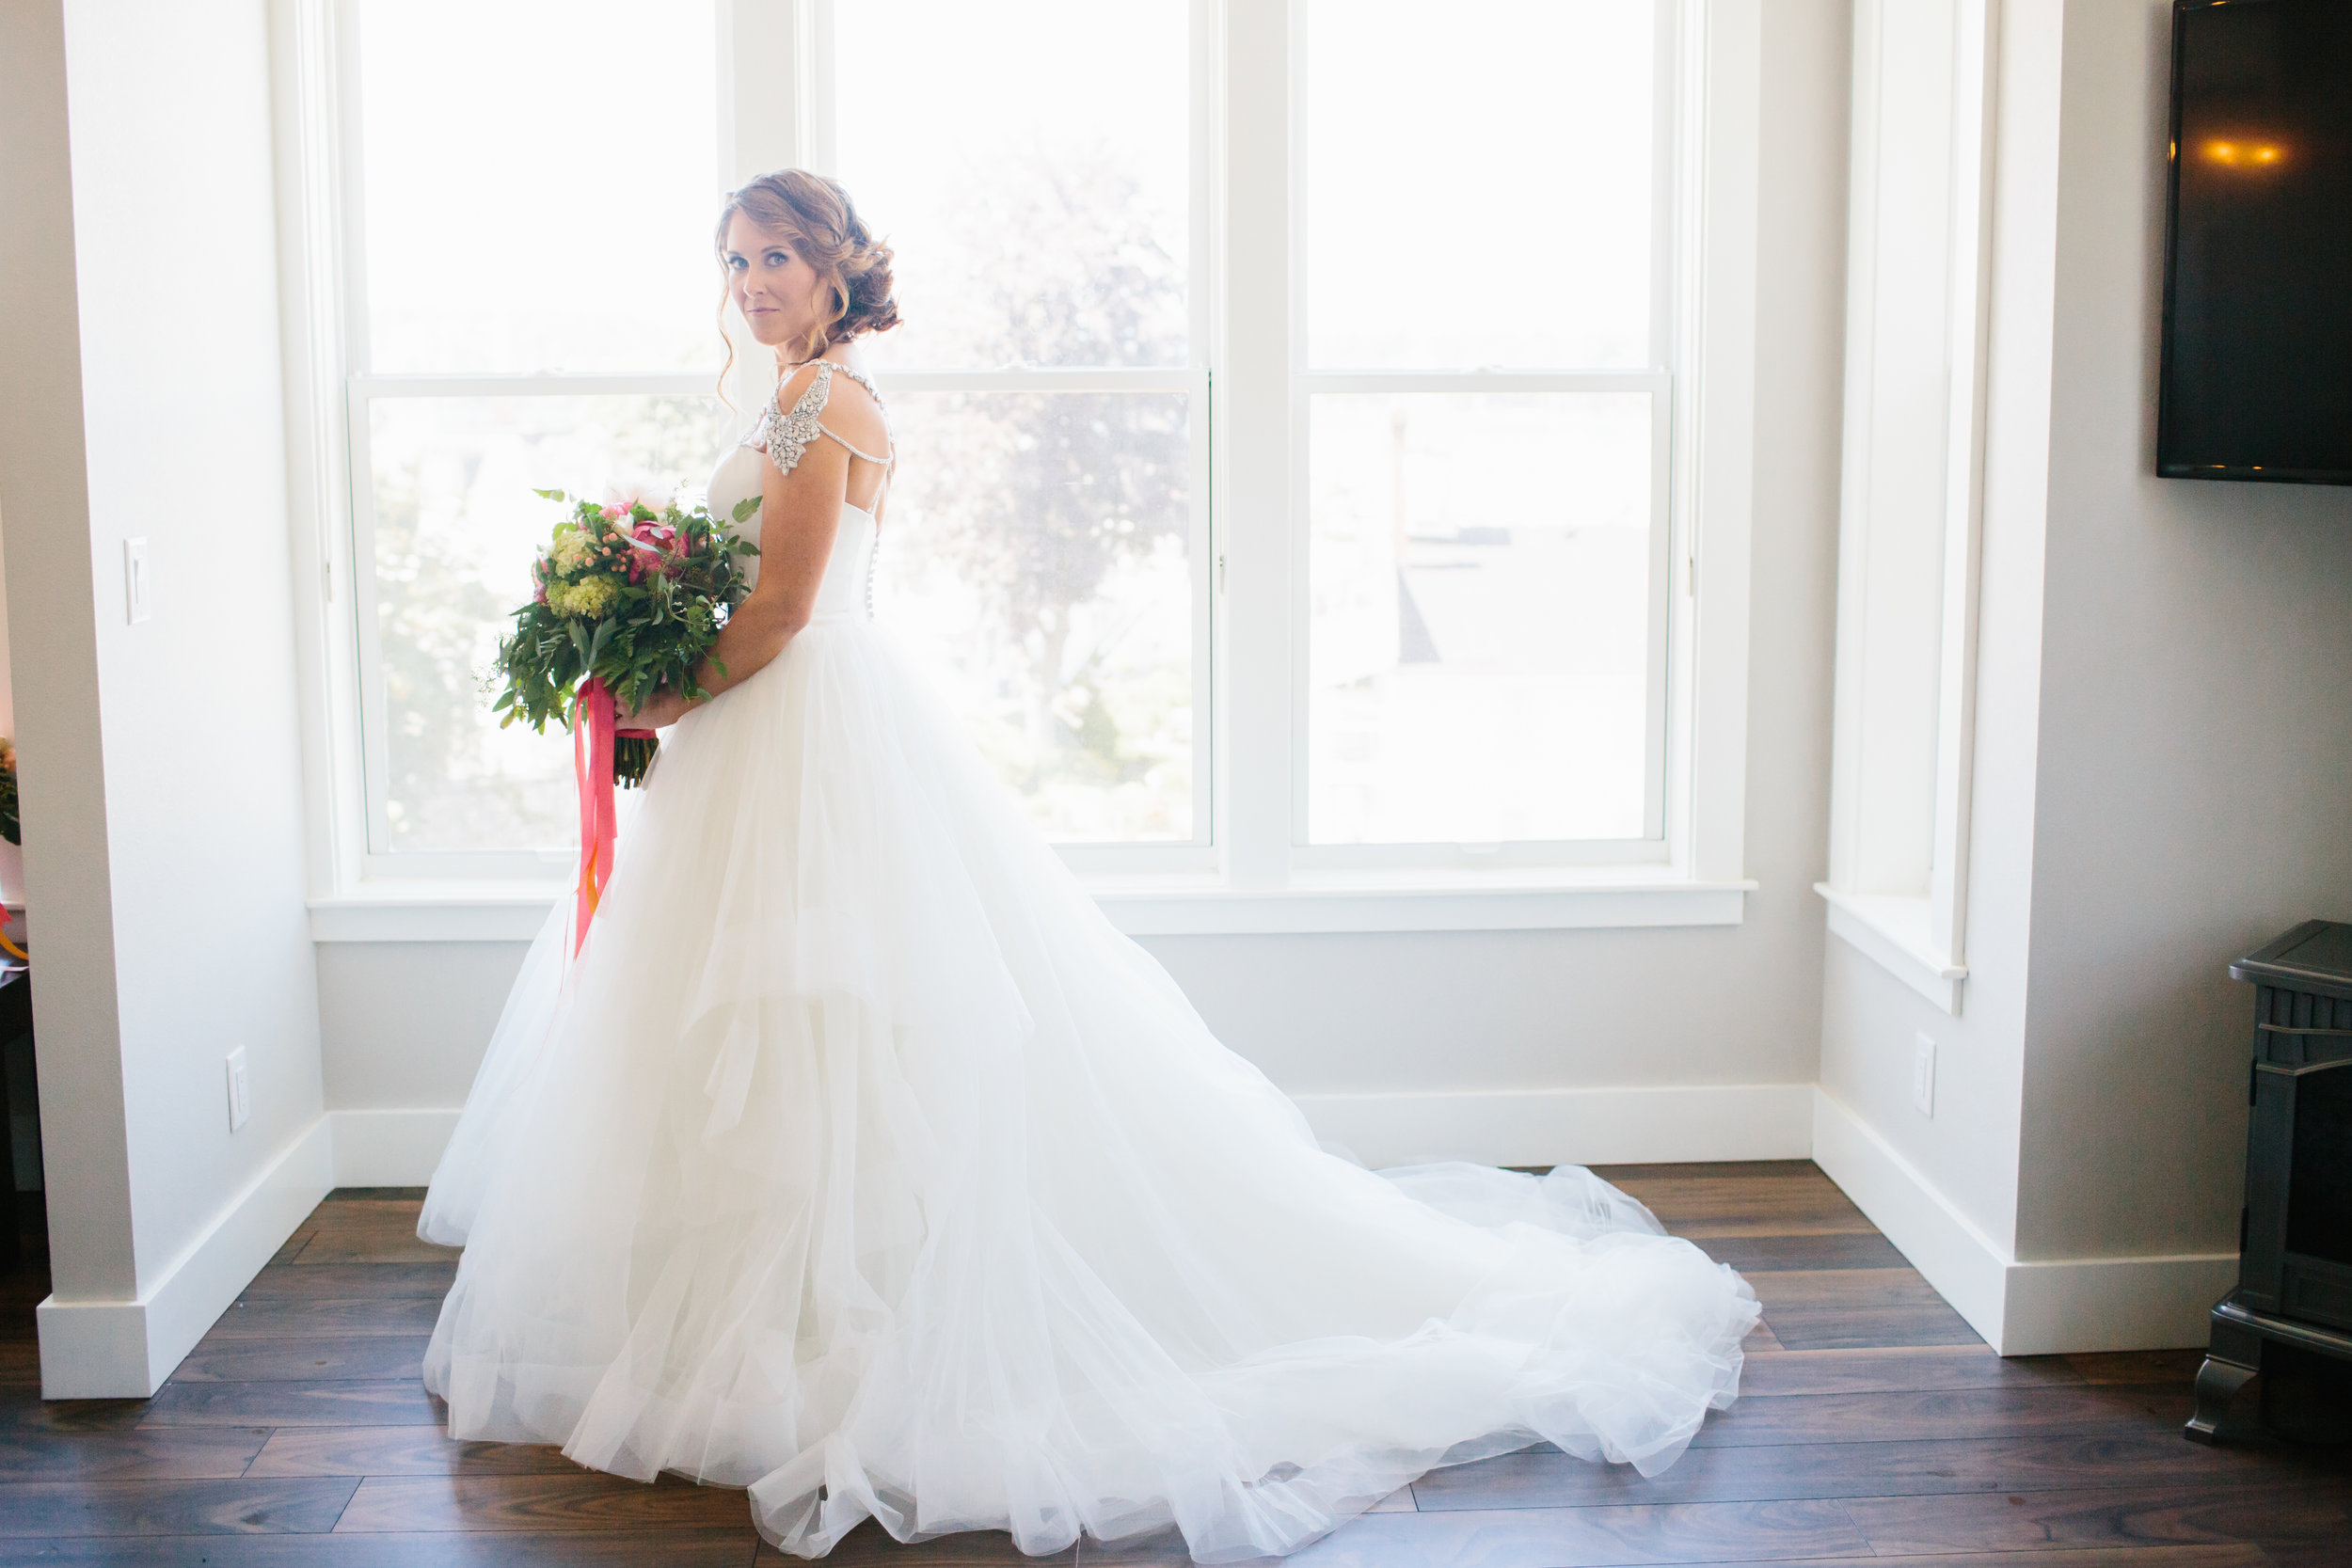 Photo by Sara Parsons. Wedding Dress from I Do Bridal